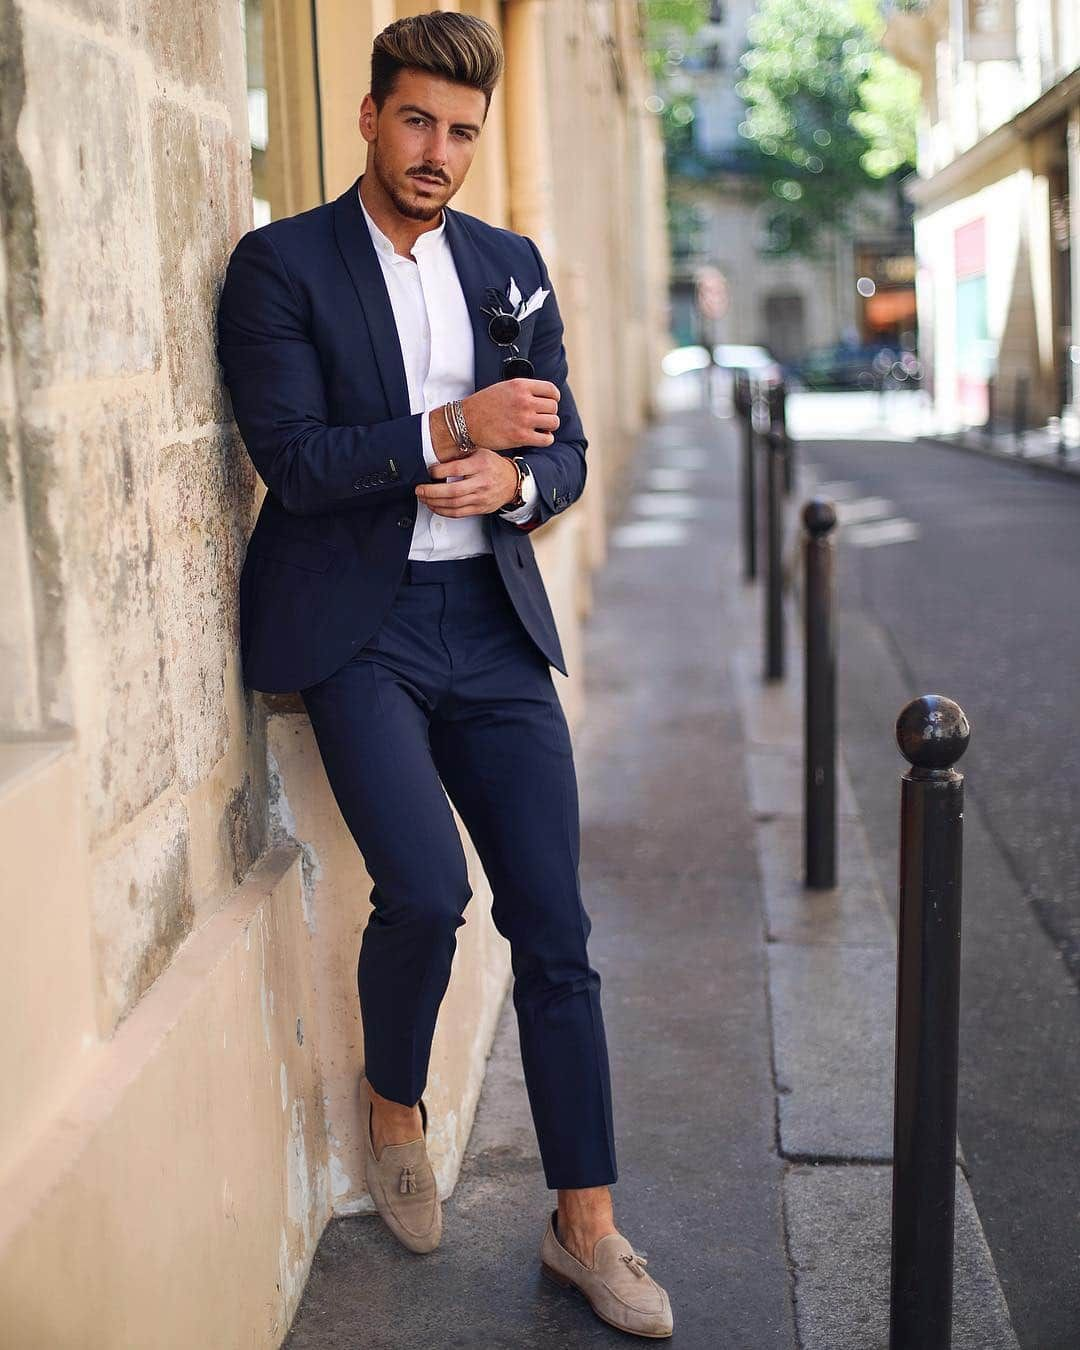 Dark blue suit, mandarin collar white shirt, and loafers